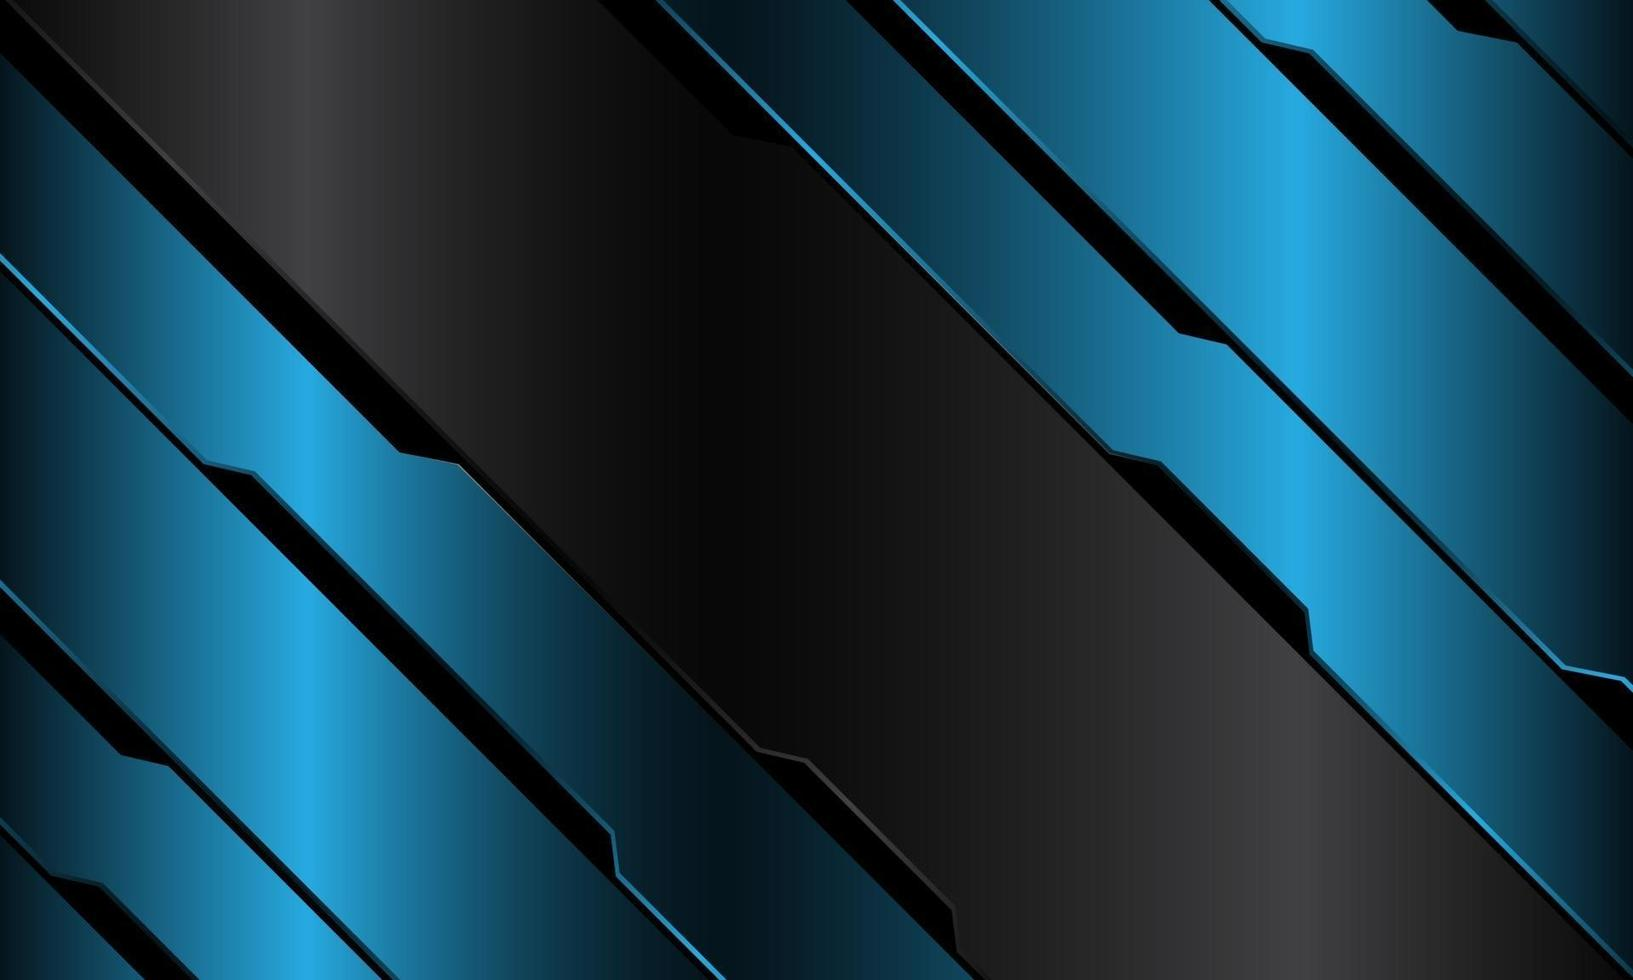 Abstract grey banner blue metallic black circuit cyber geometric slash design modern luxury futuristic technology background vector illustration.